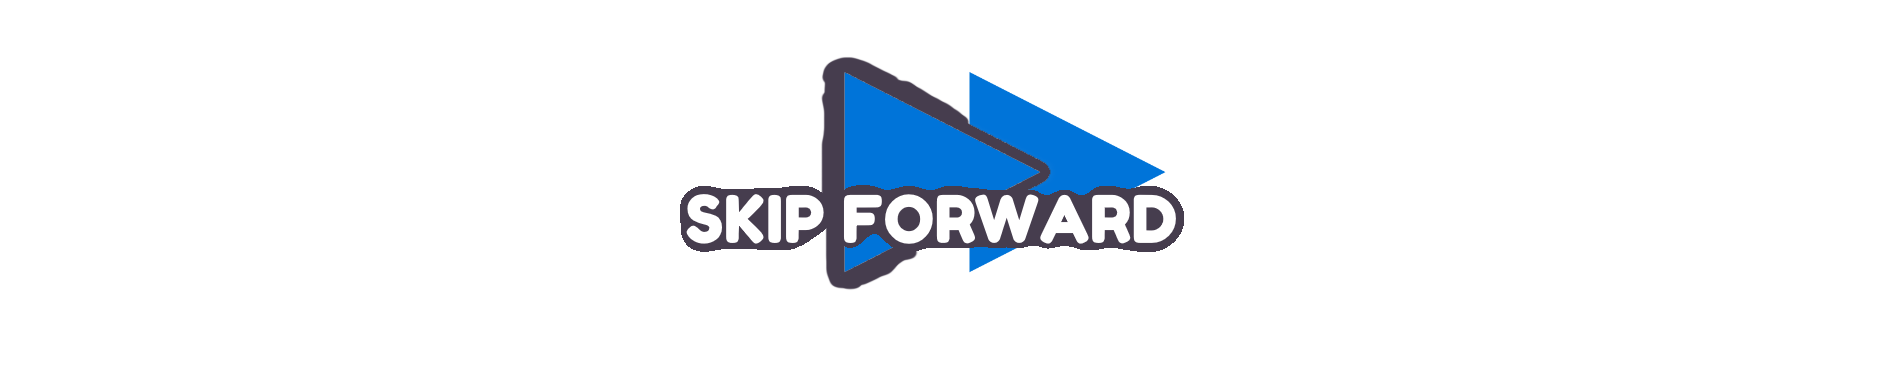 SKIP FORWARD